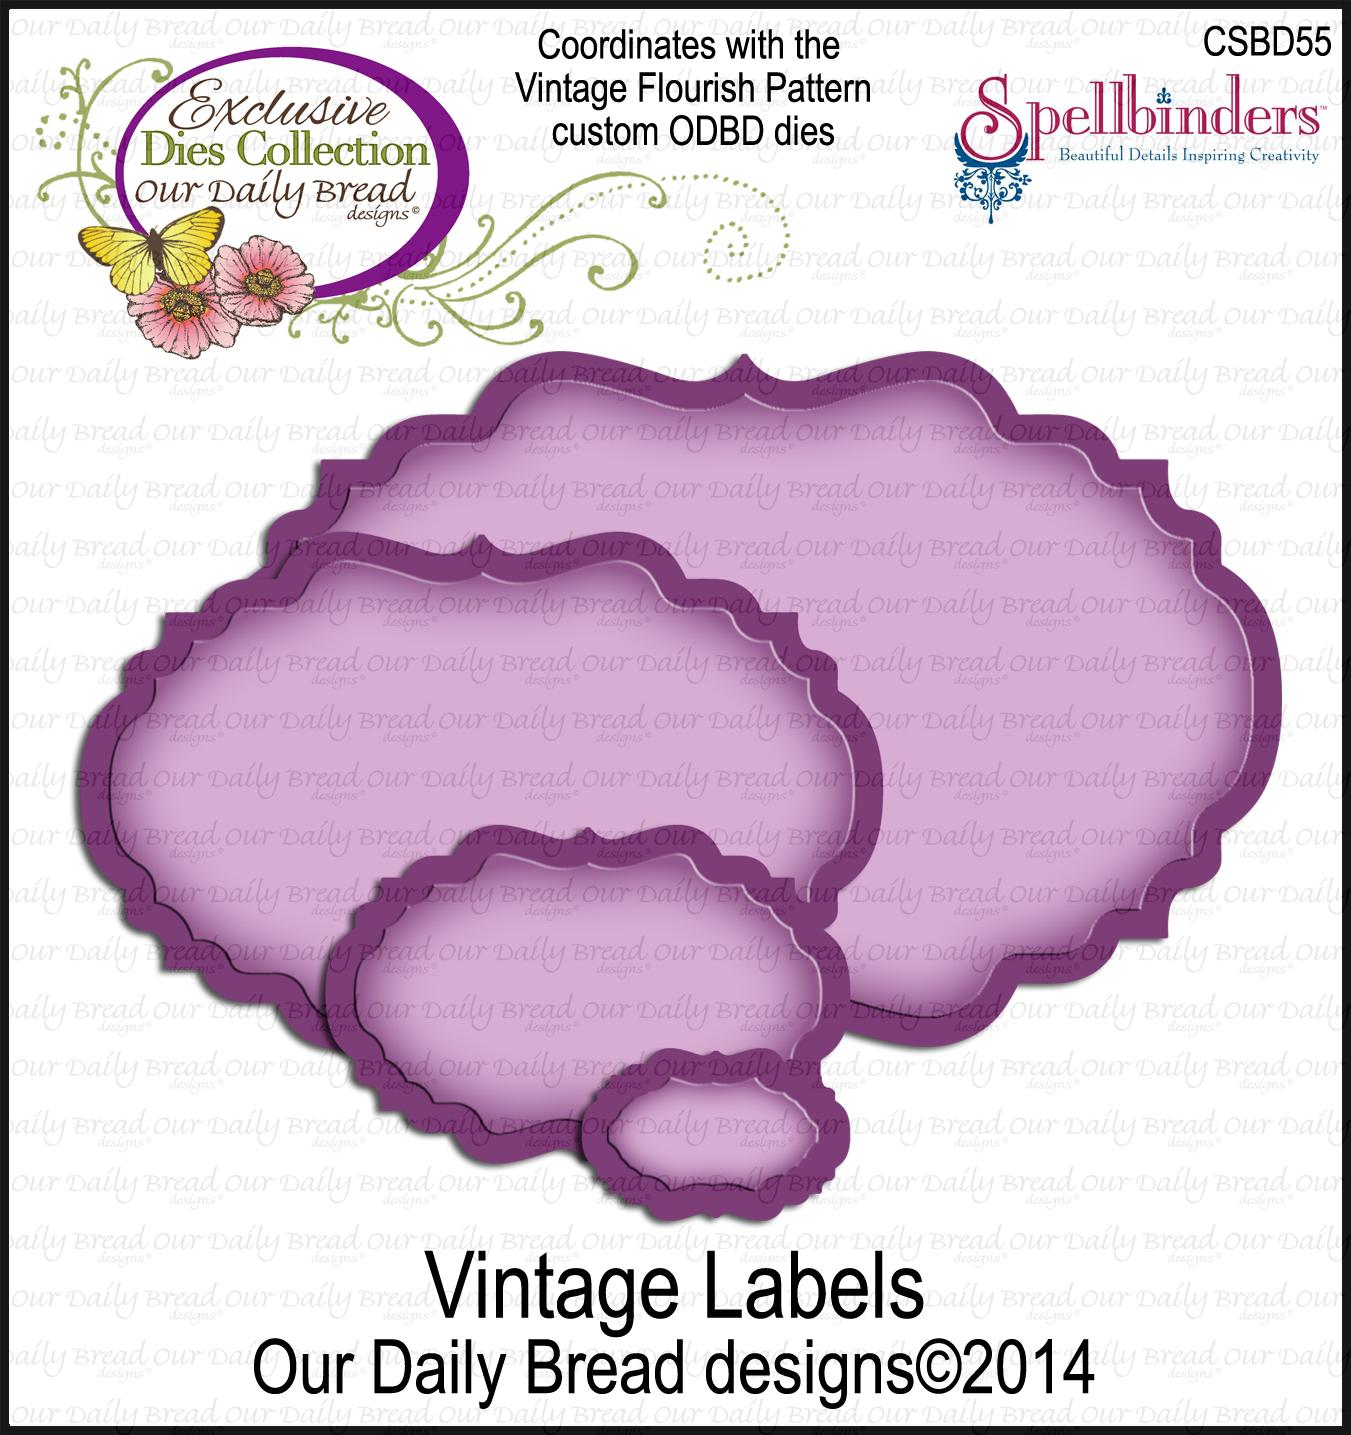 http://www.ourdailybreaddesigns.com/index.php/csbd55-vintage-label-dies.html